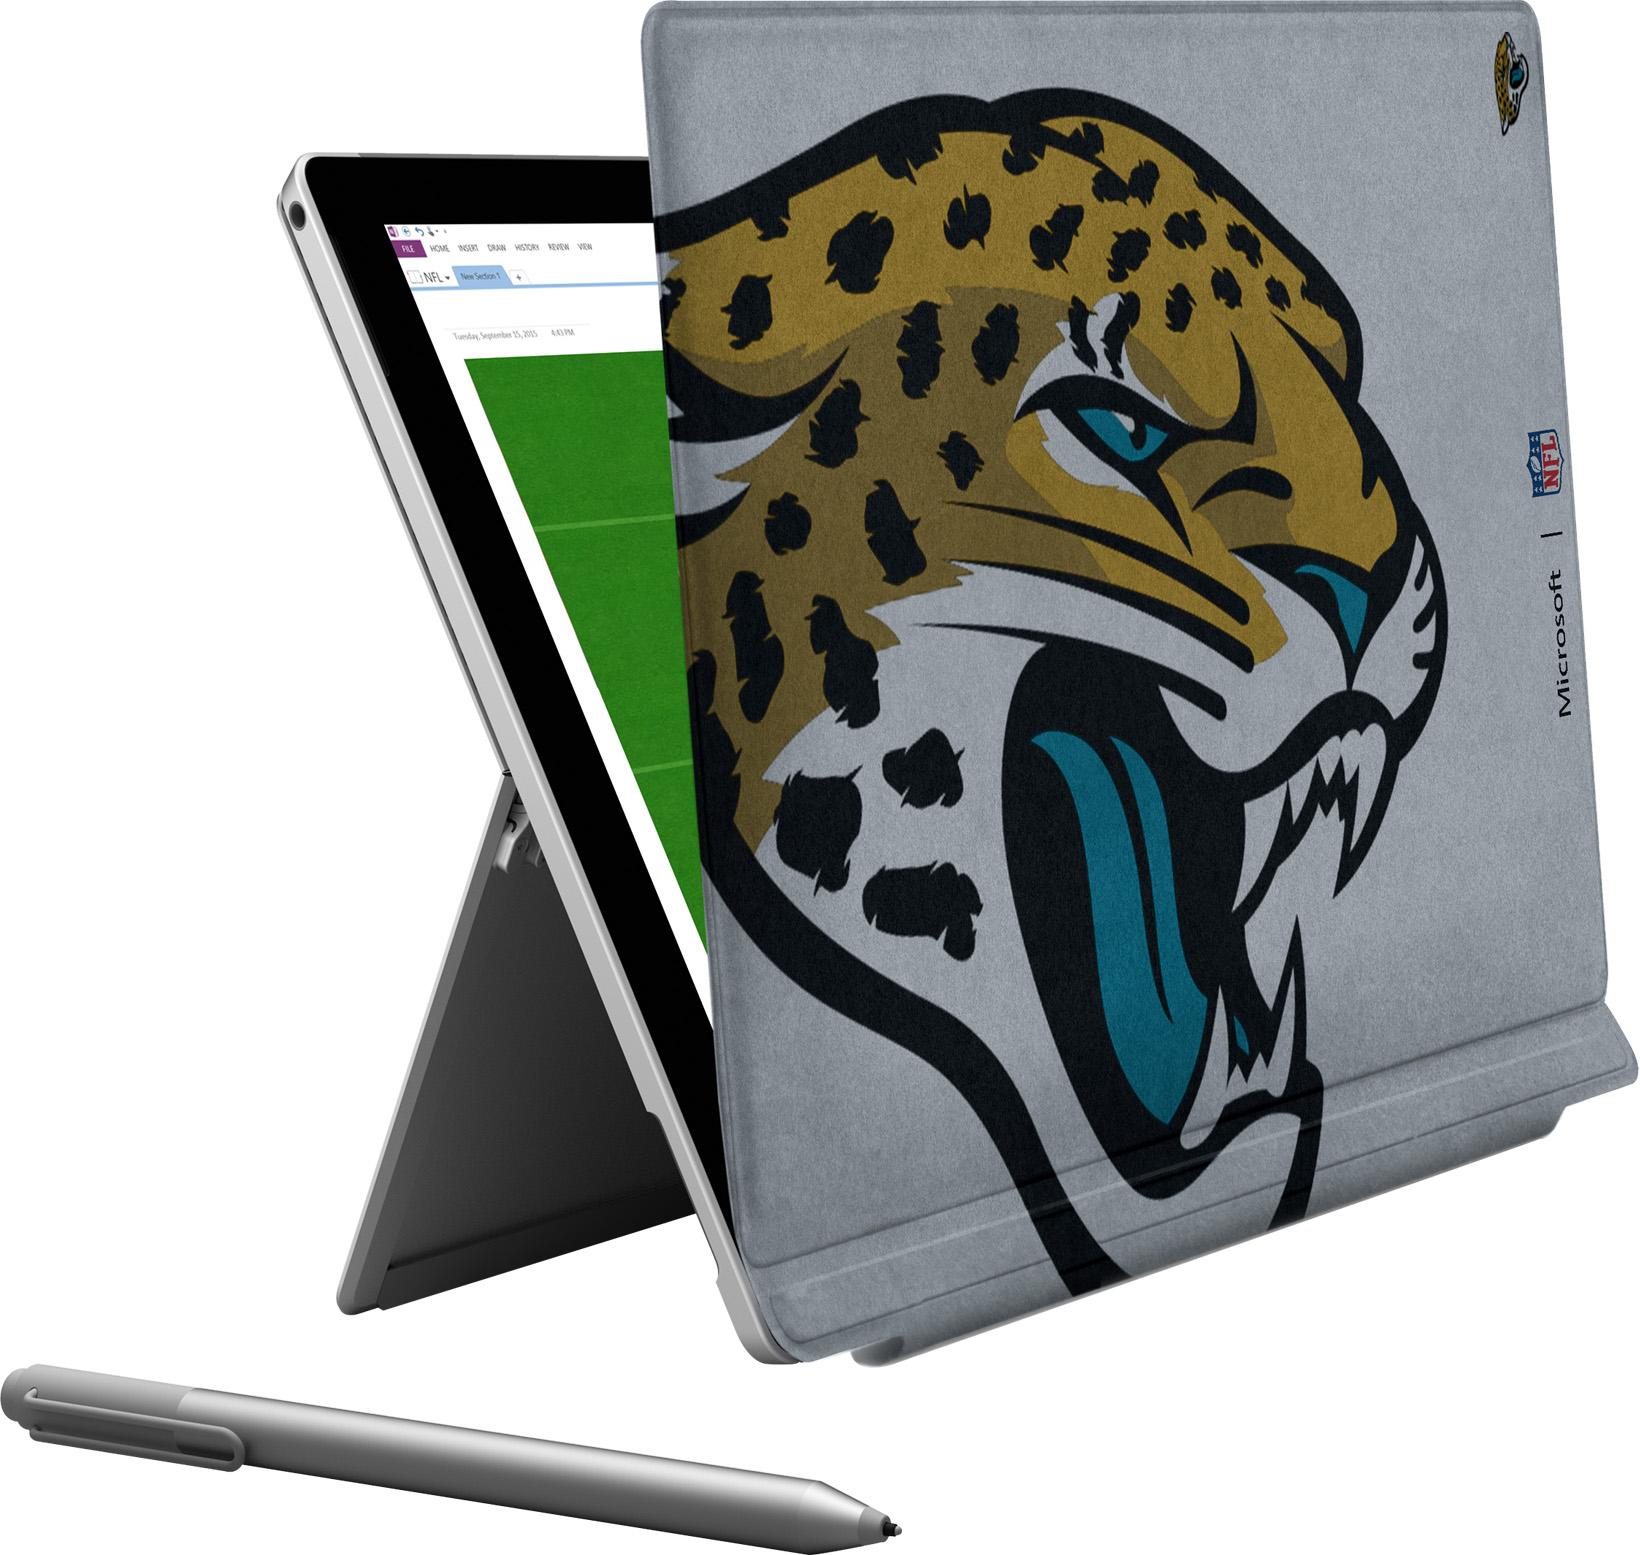 Microsoft Surface Pro 4 Jacksonville Jaguars Type Cover